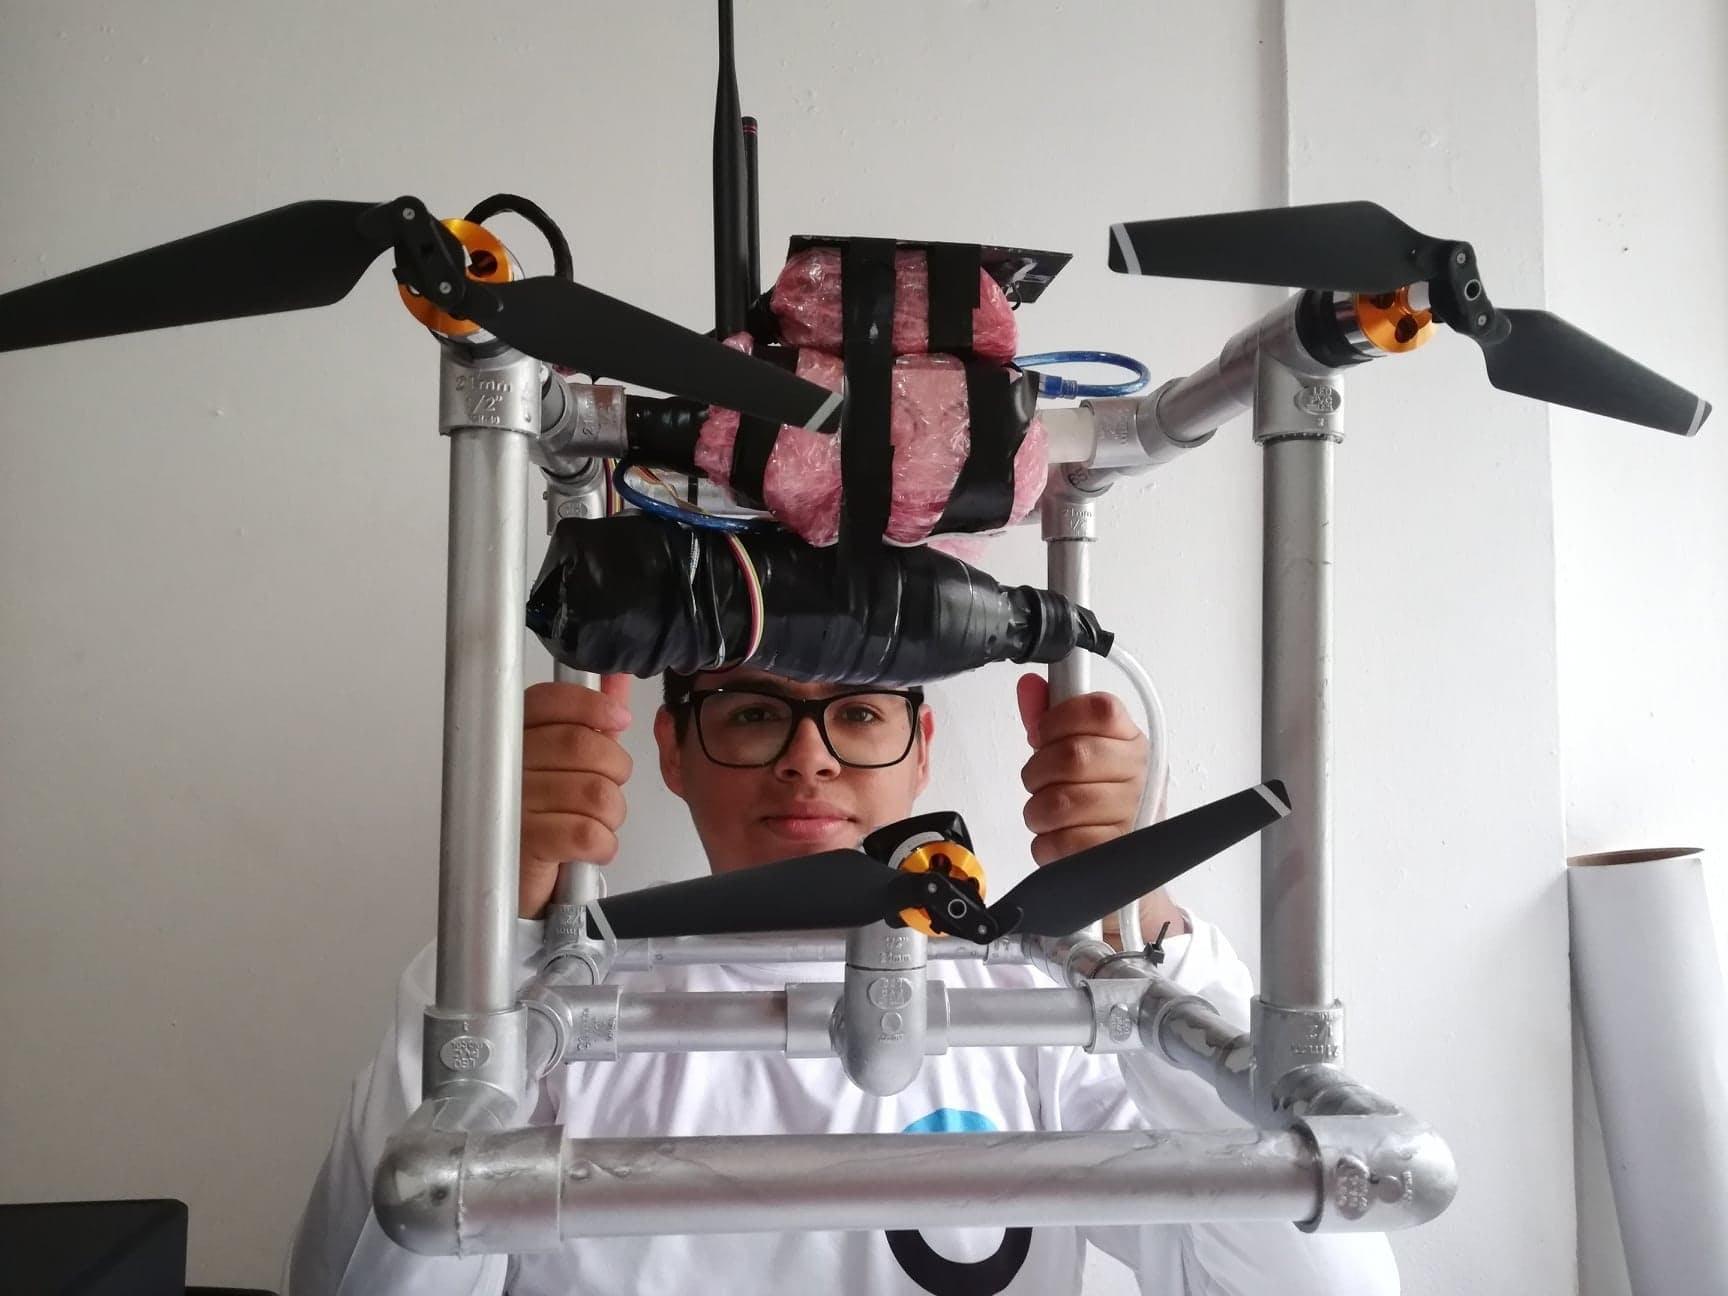 Underwater Monitoring and Sampling Robot